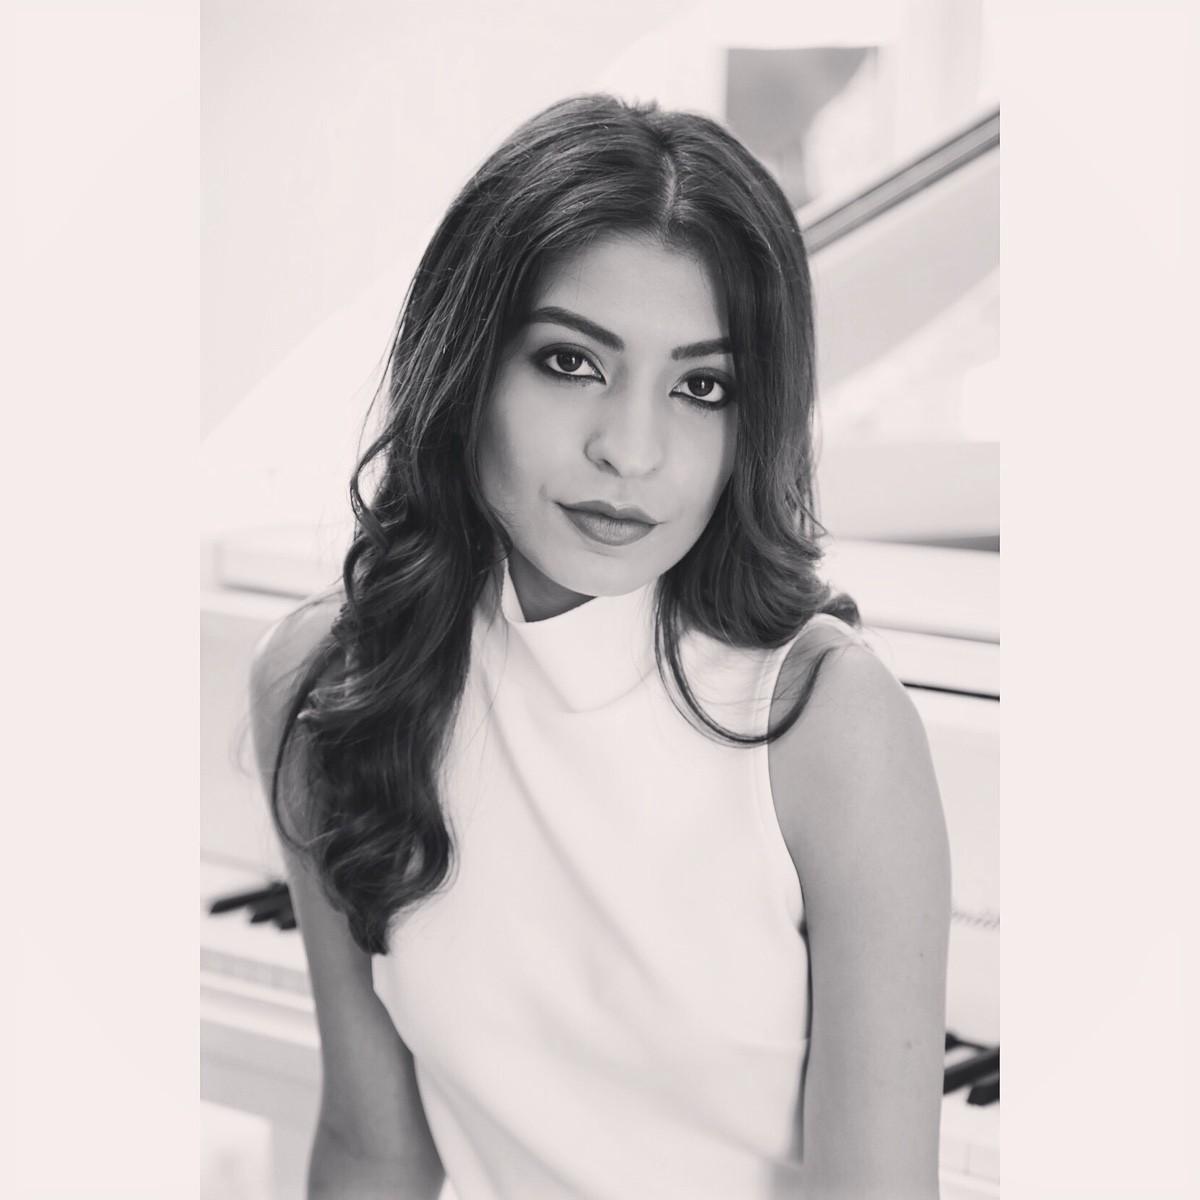 Priyanka Ghaghda